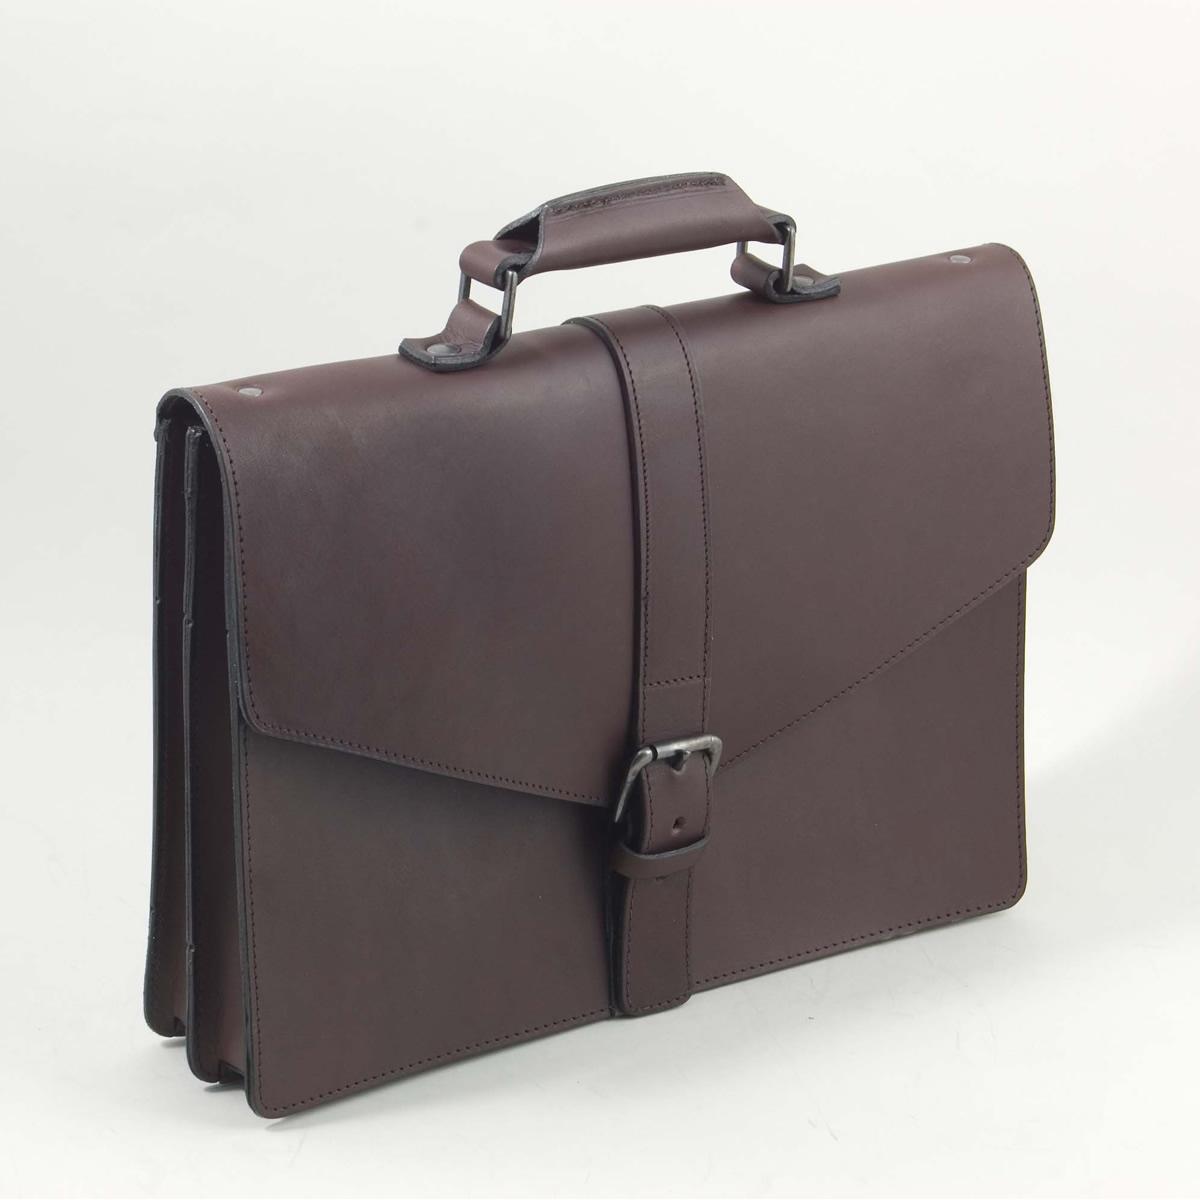 The Briefcase Lite - Buckle